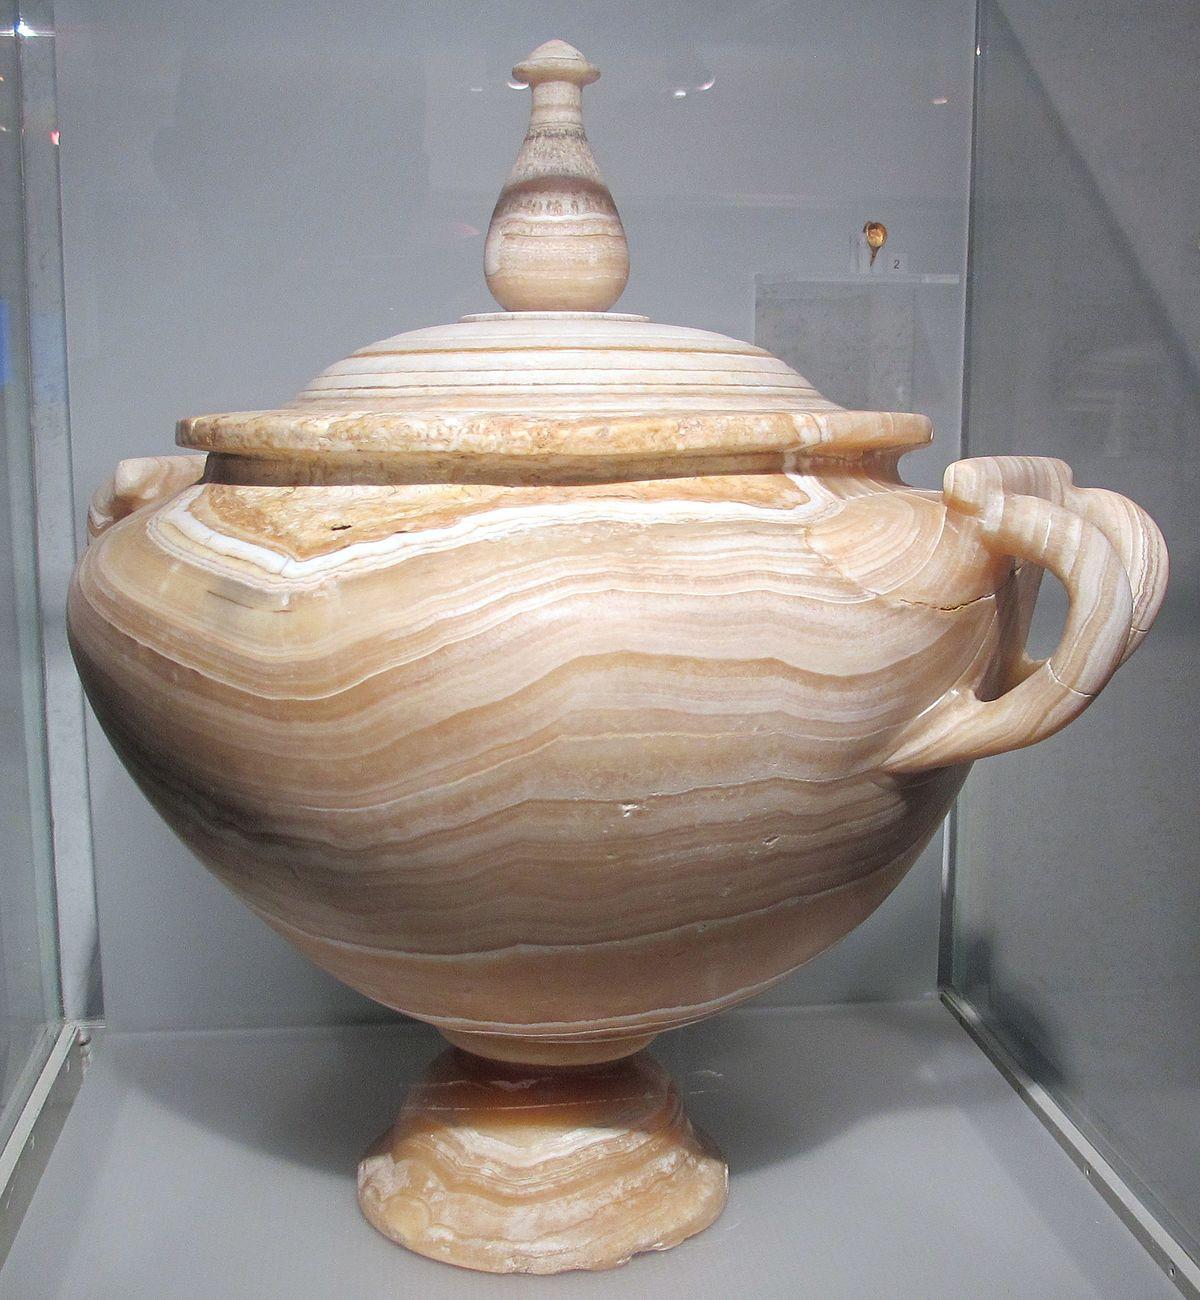 large ceramic vases and urns of urn wikipedia with regard to 1200px urna cineraria in alabastro da abbazia delle tre fontane via laurentina 0 50 dc ca jpg